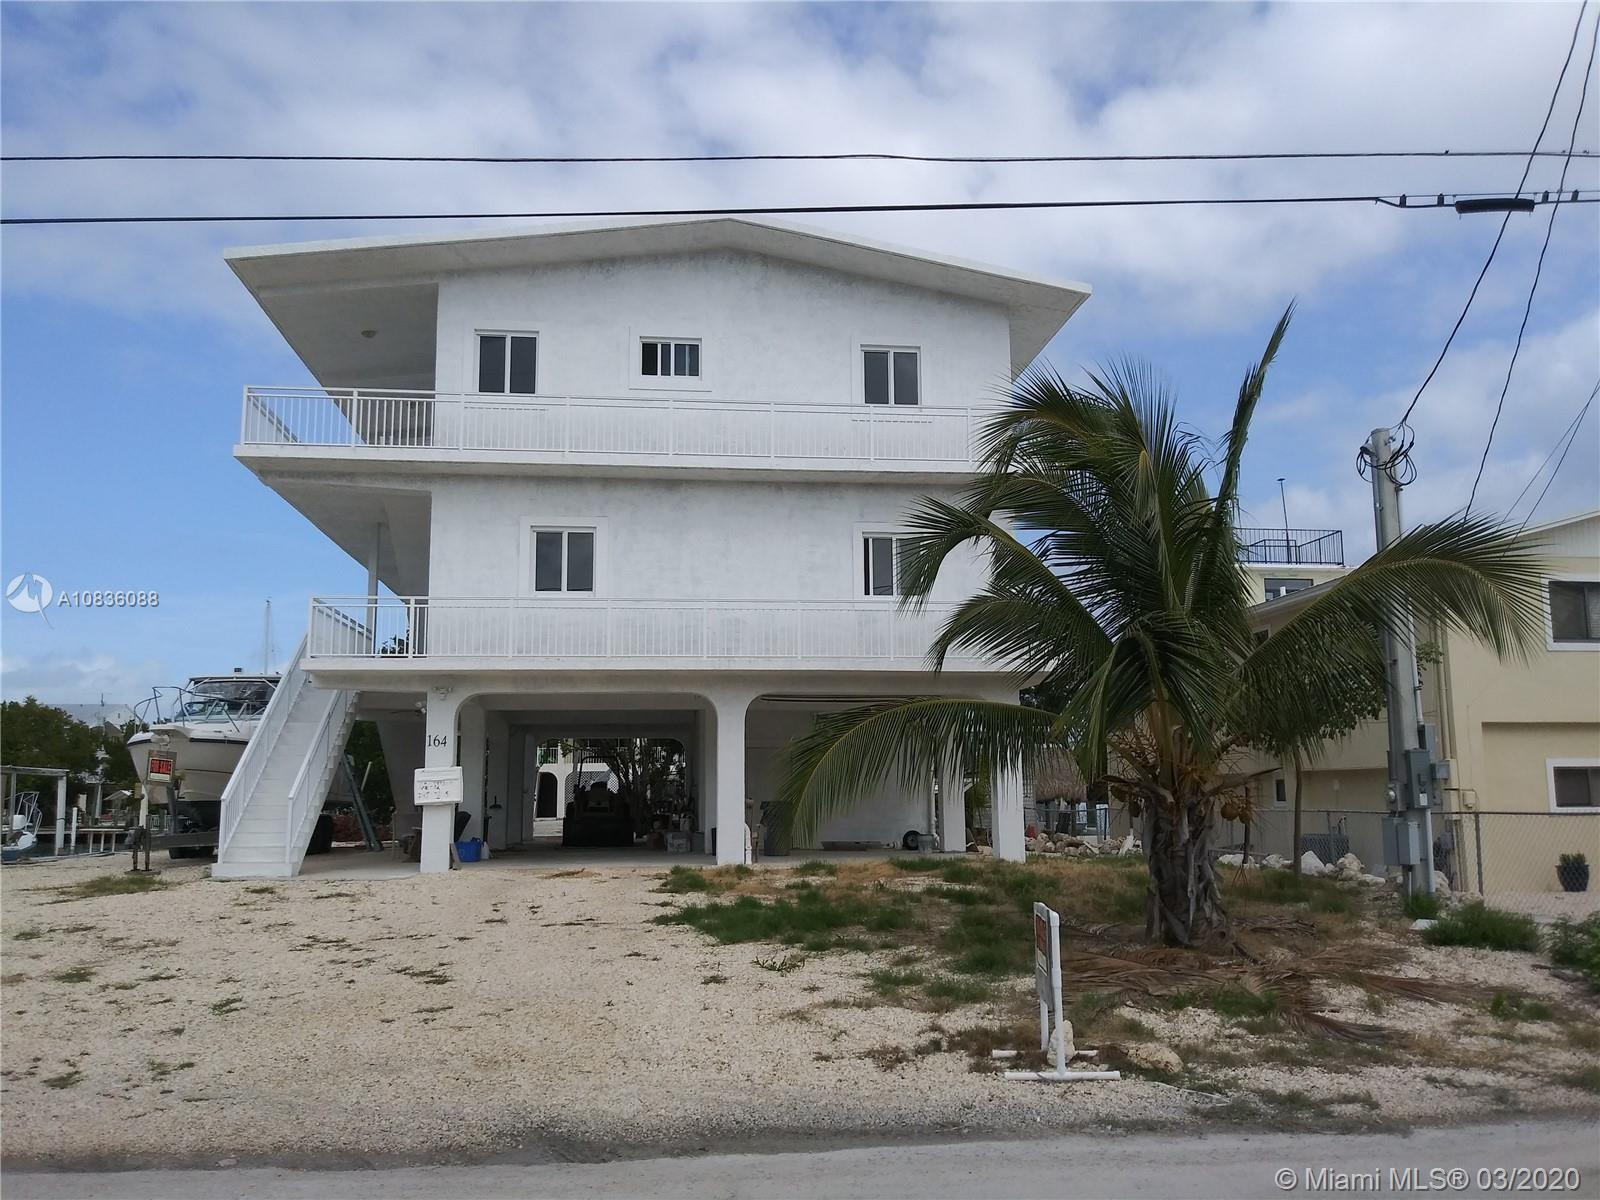 164 Lorelane Pl., Key Largo, FL 33037